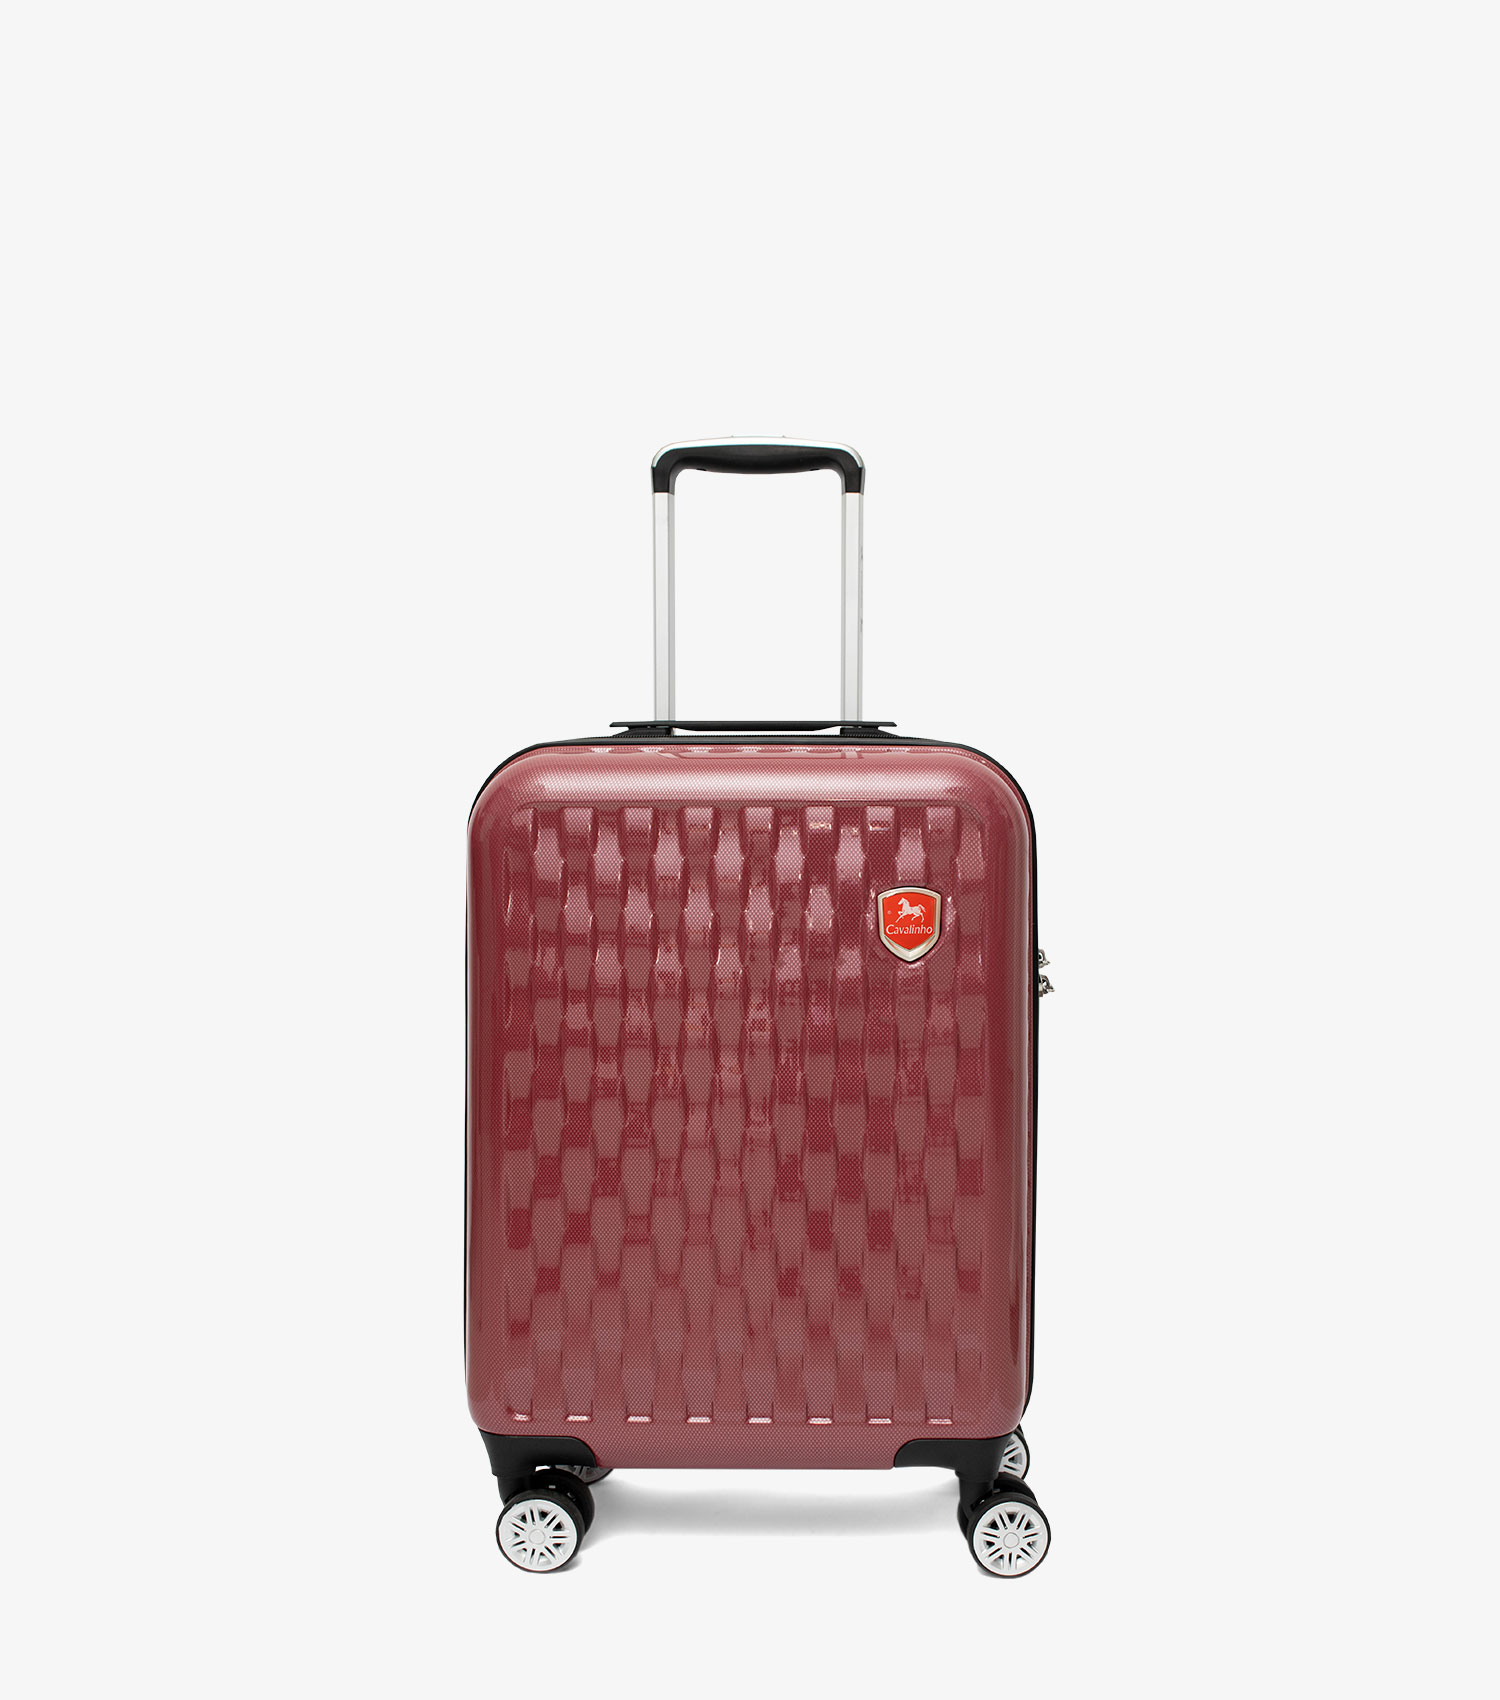 trolley de cabine premium traveller_1.jpg